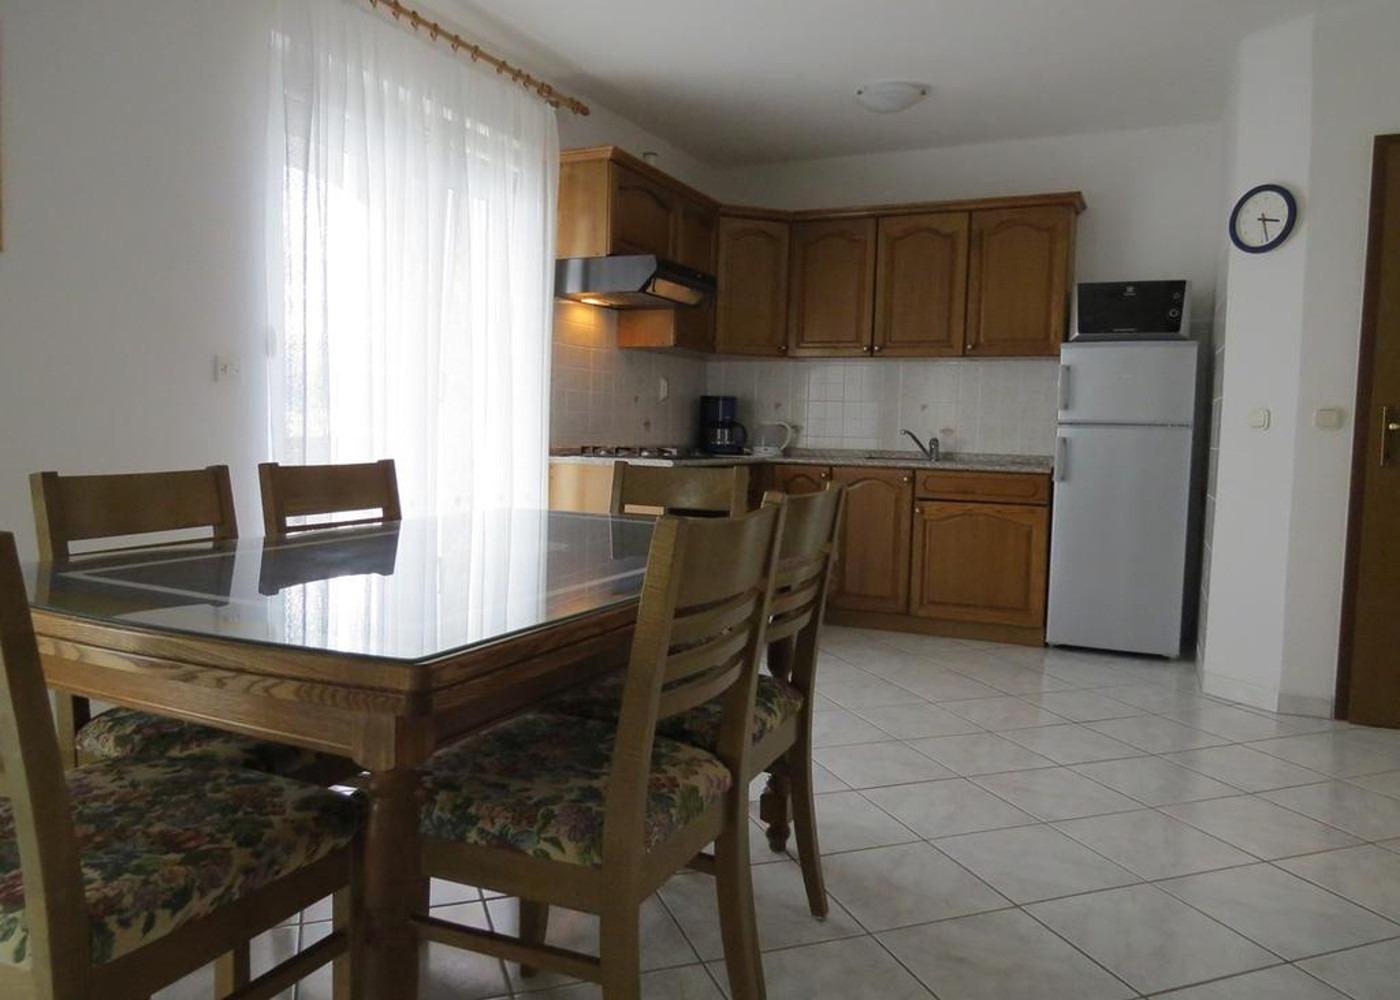 Bubi - Mastrinka - Appartementen Kroatië - A2 Prvi kat(4+2): keuken en eetkamer